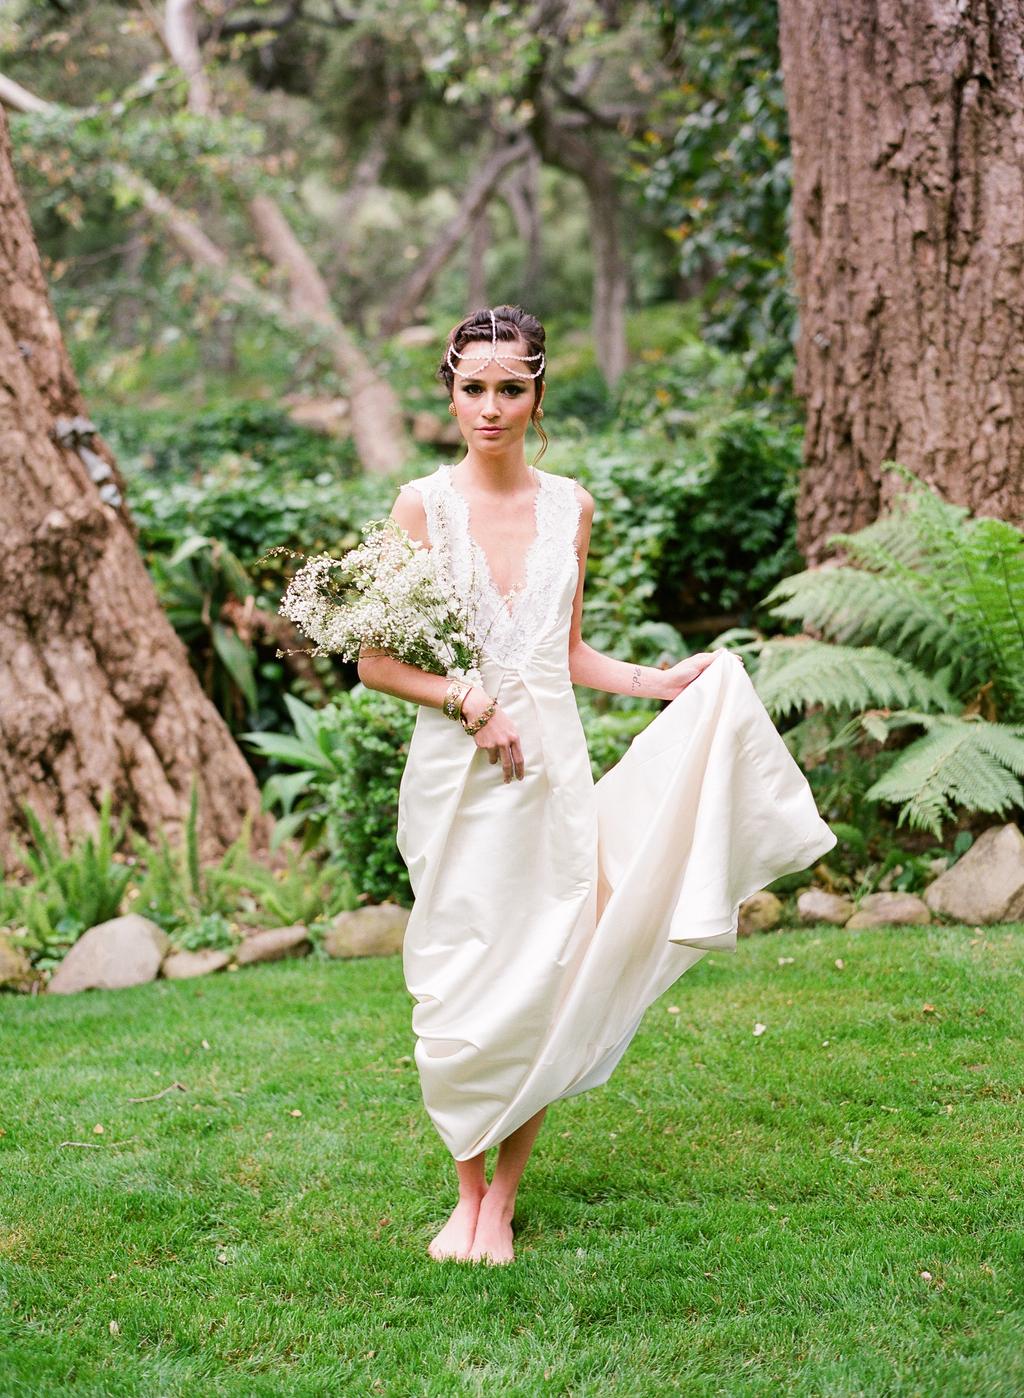 Styled-wedding-santa-barbara-chic-beaux-arts-photographie-italian-bohemian-wedding-bride-wedding-dress-lace-white-flowers-bouquet-050.full